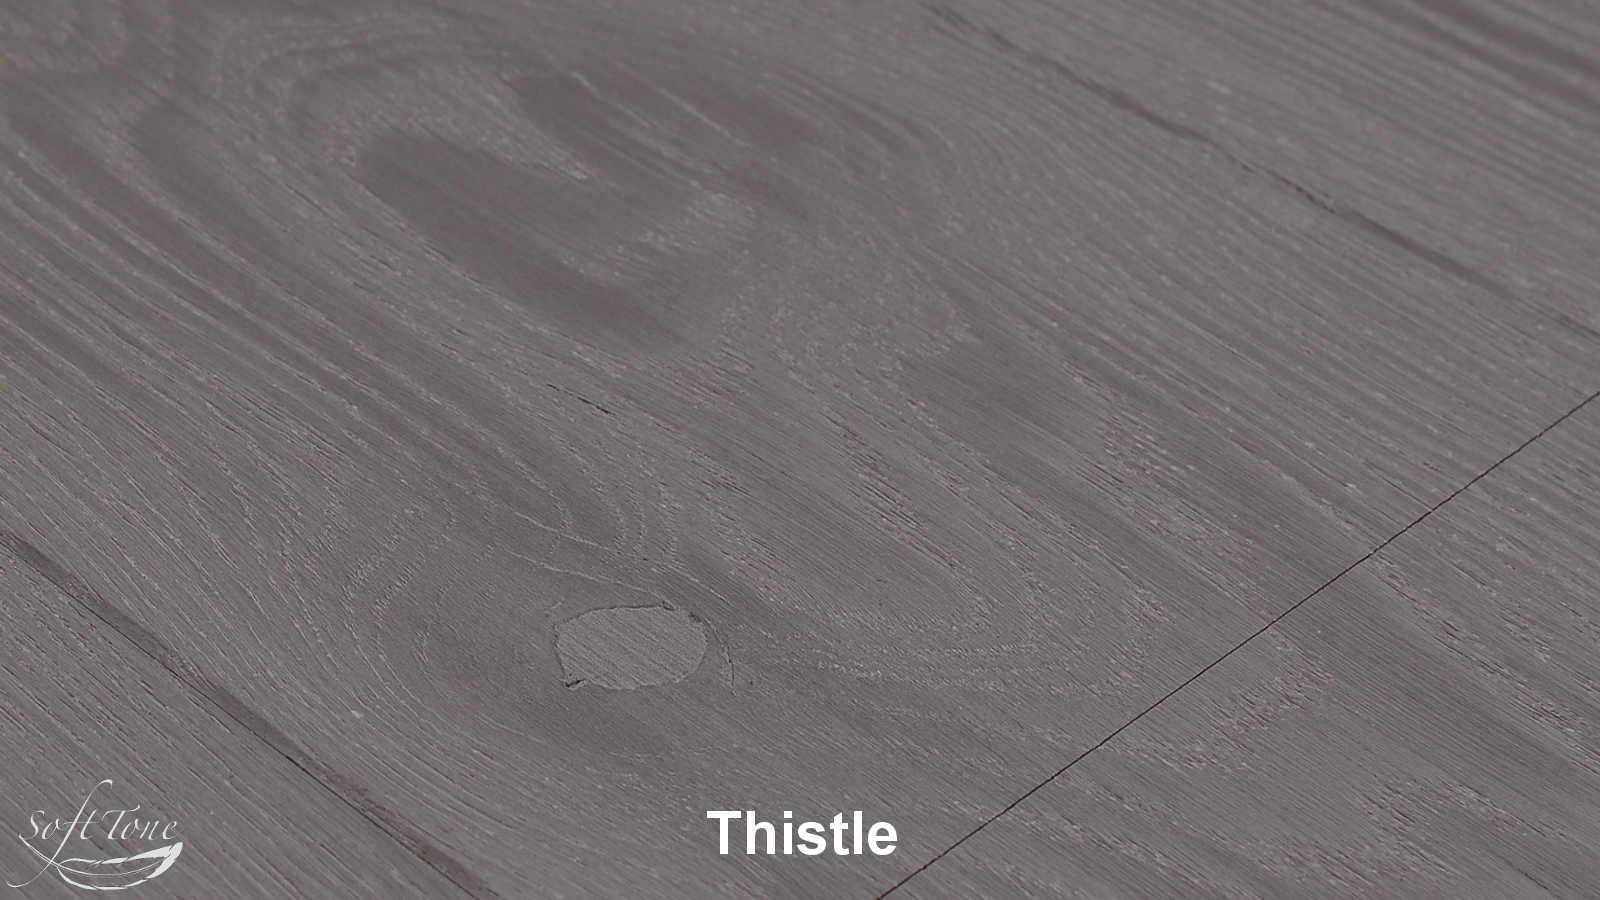 Kolekcja: ESCO Soft Tone, Kolor: Thistle